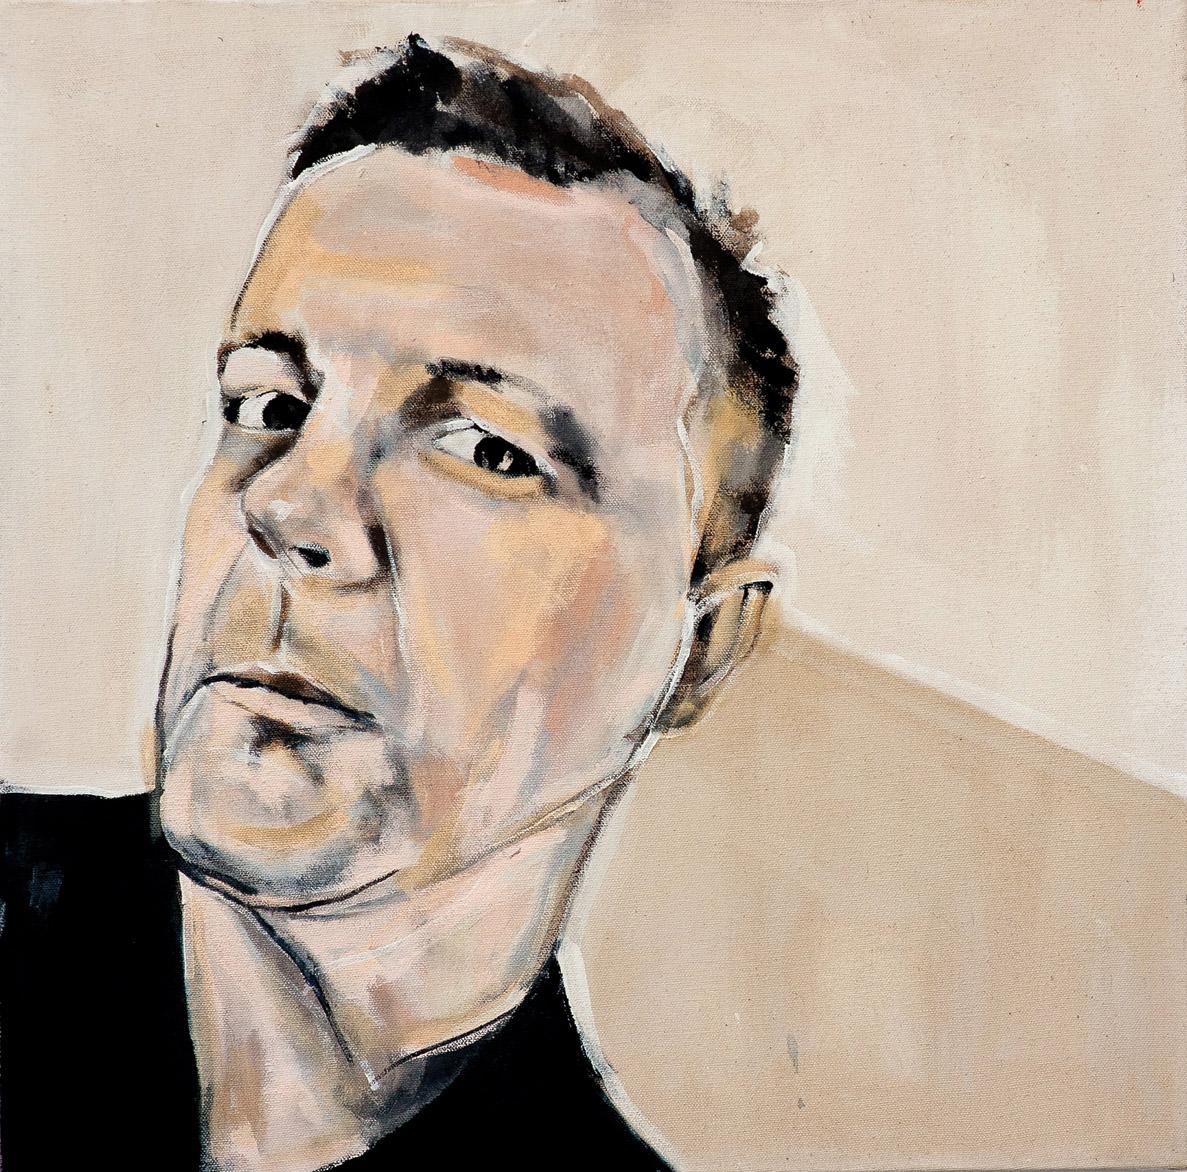 Painting of Christian Bök by Melanie Janisse-Barlow